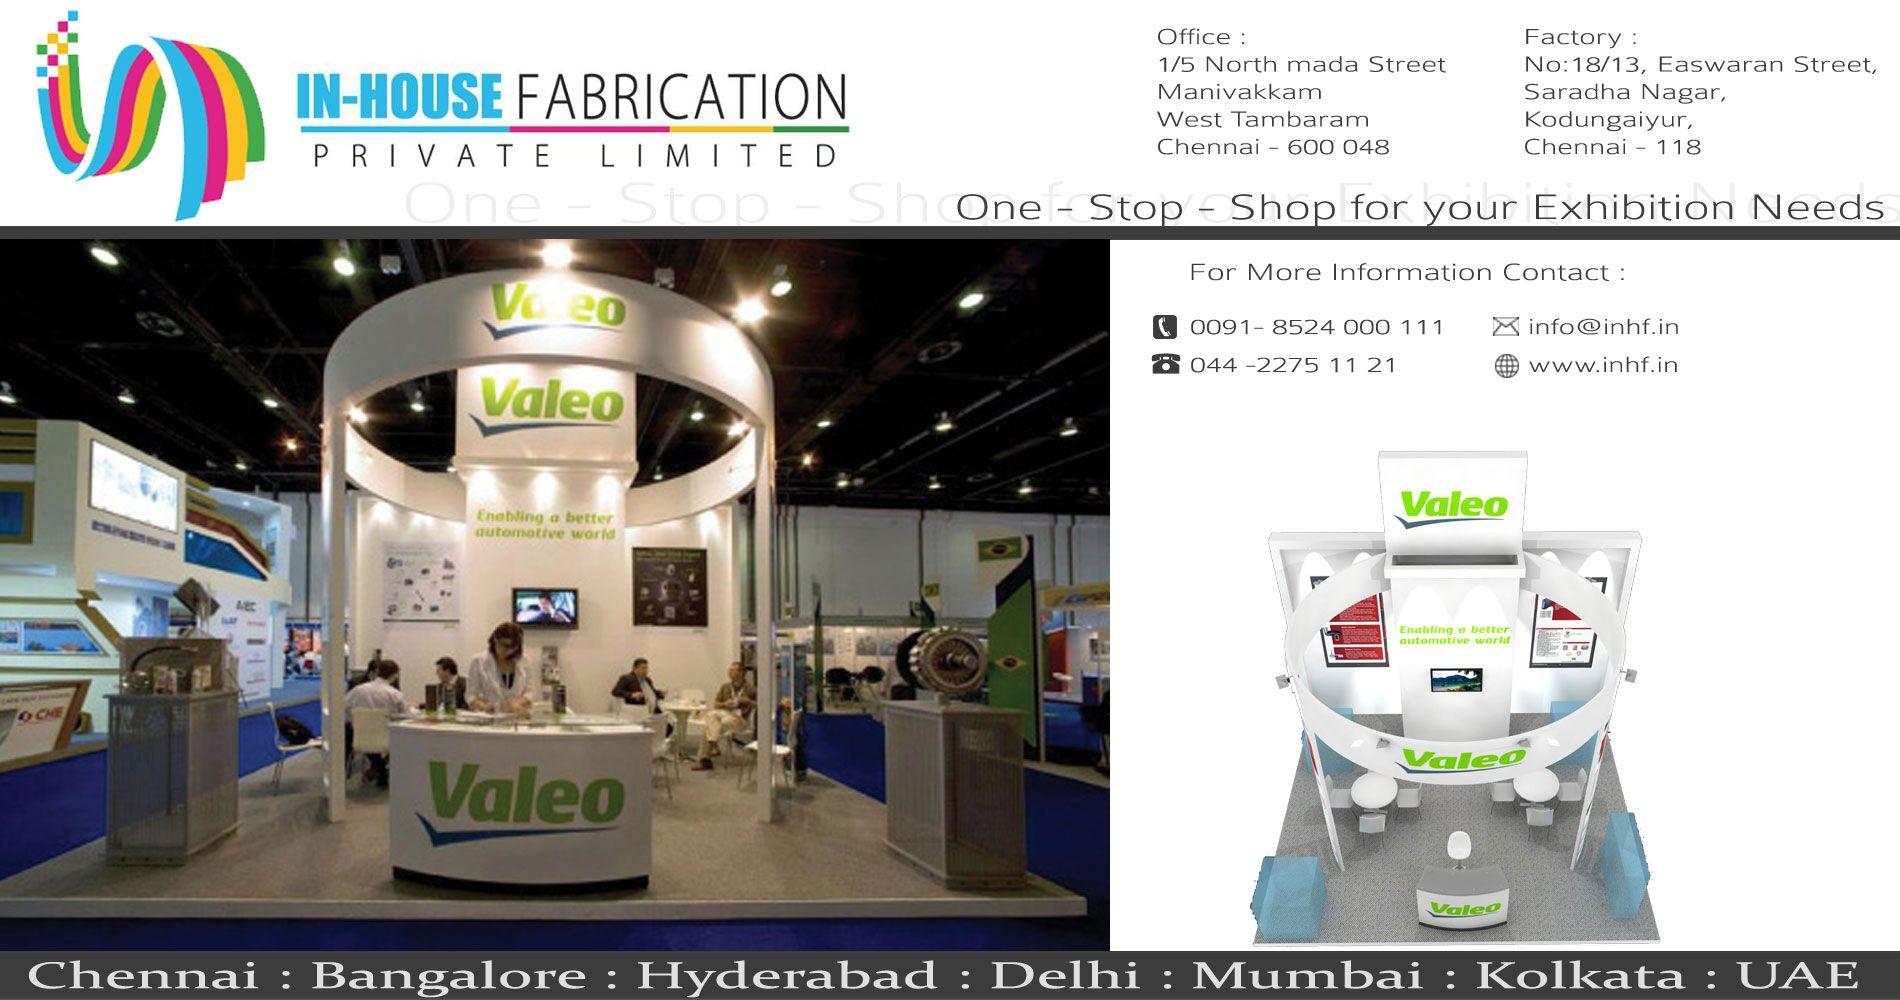 Exhibition Stall Fabricators In Chennai : Exhibition stall fabricators in chennai exhibition stall design